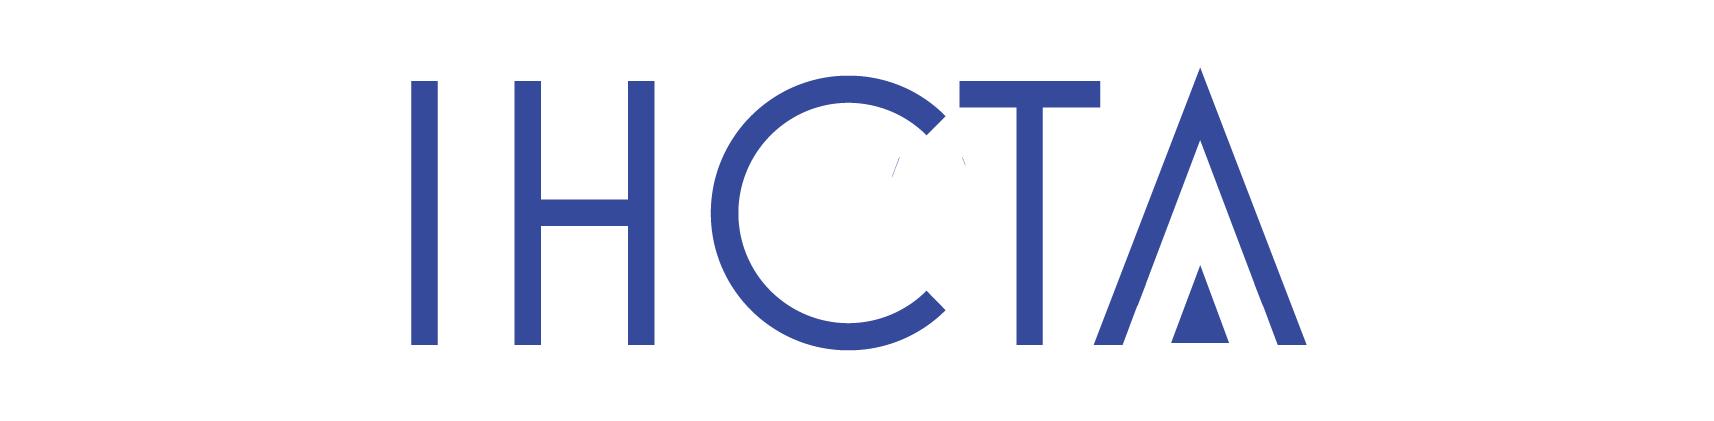 3 IHCTA Logotype A Hi Rez.png